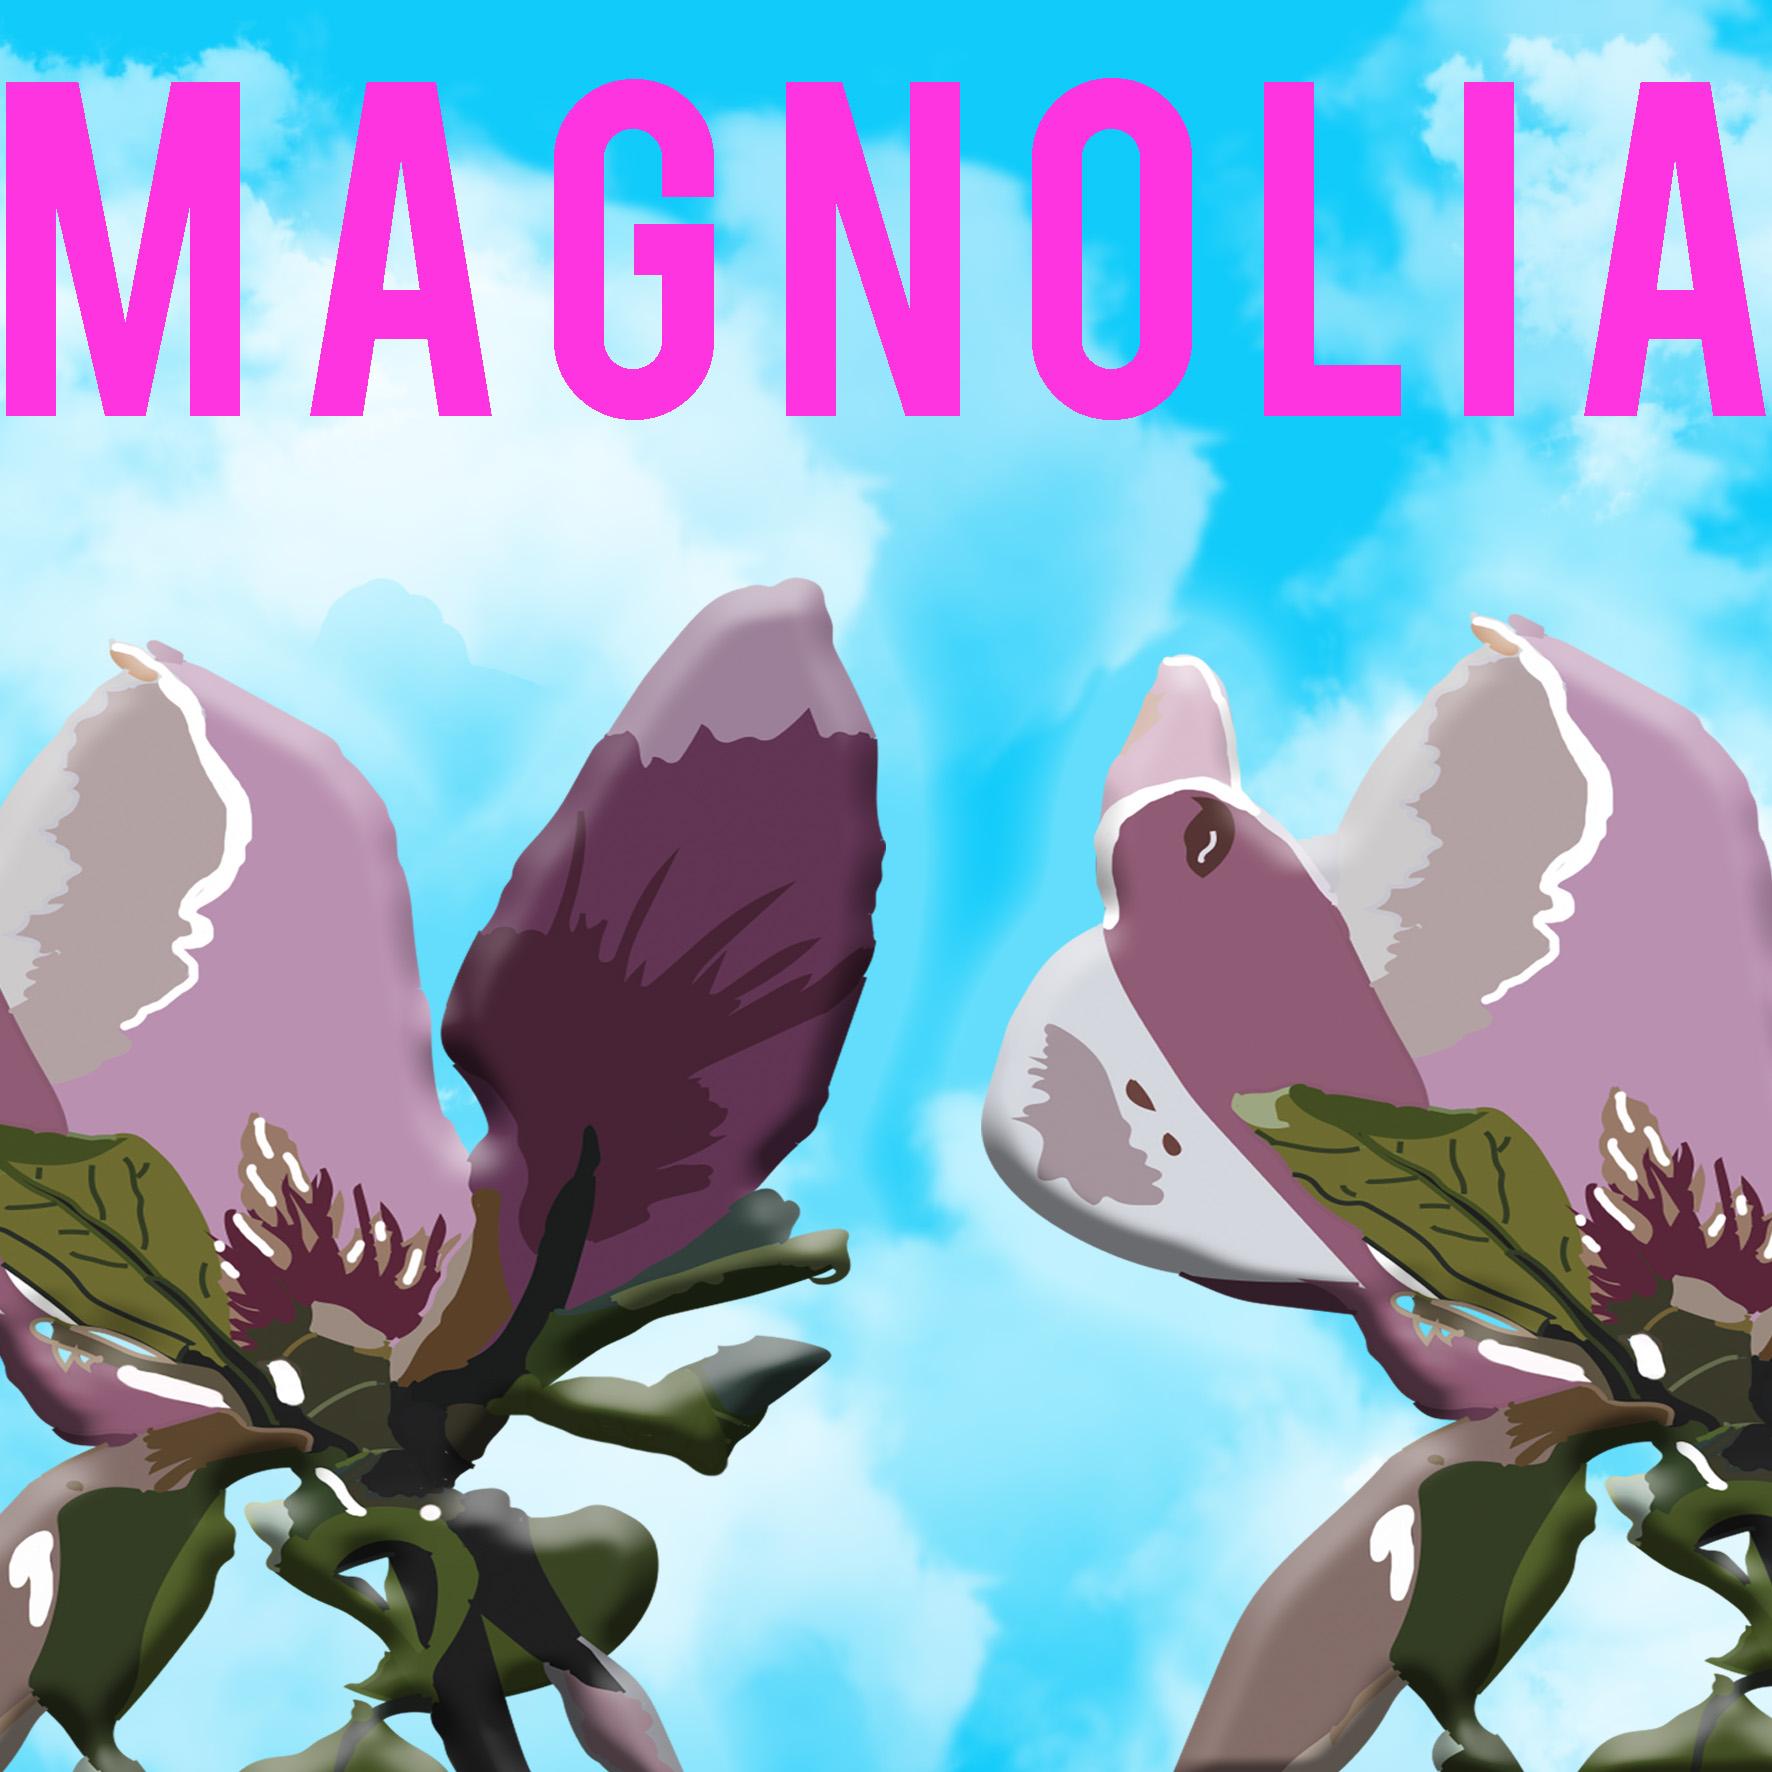 Magnolia-5.jpg